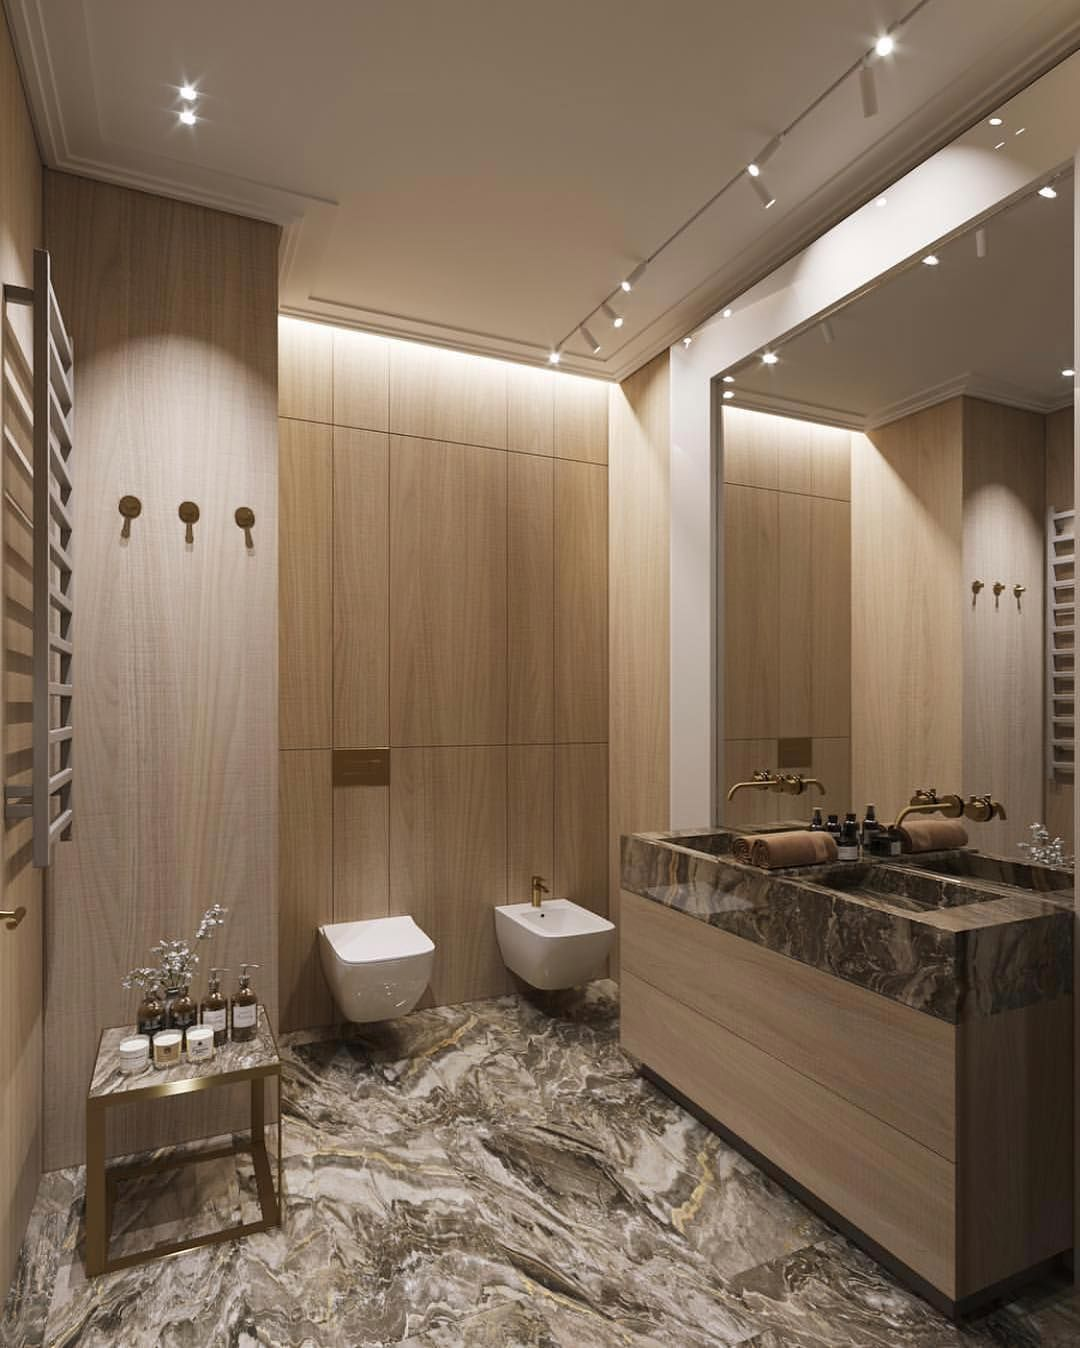 Best Furniture Store Near Me Home Decor Online Bathroom Design Best Interior Design